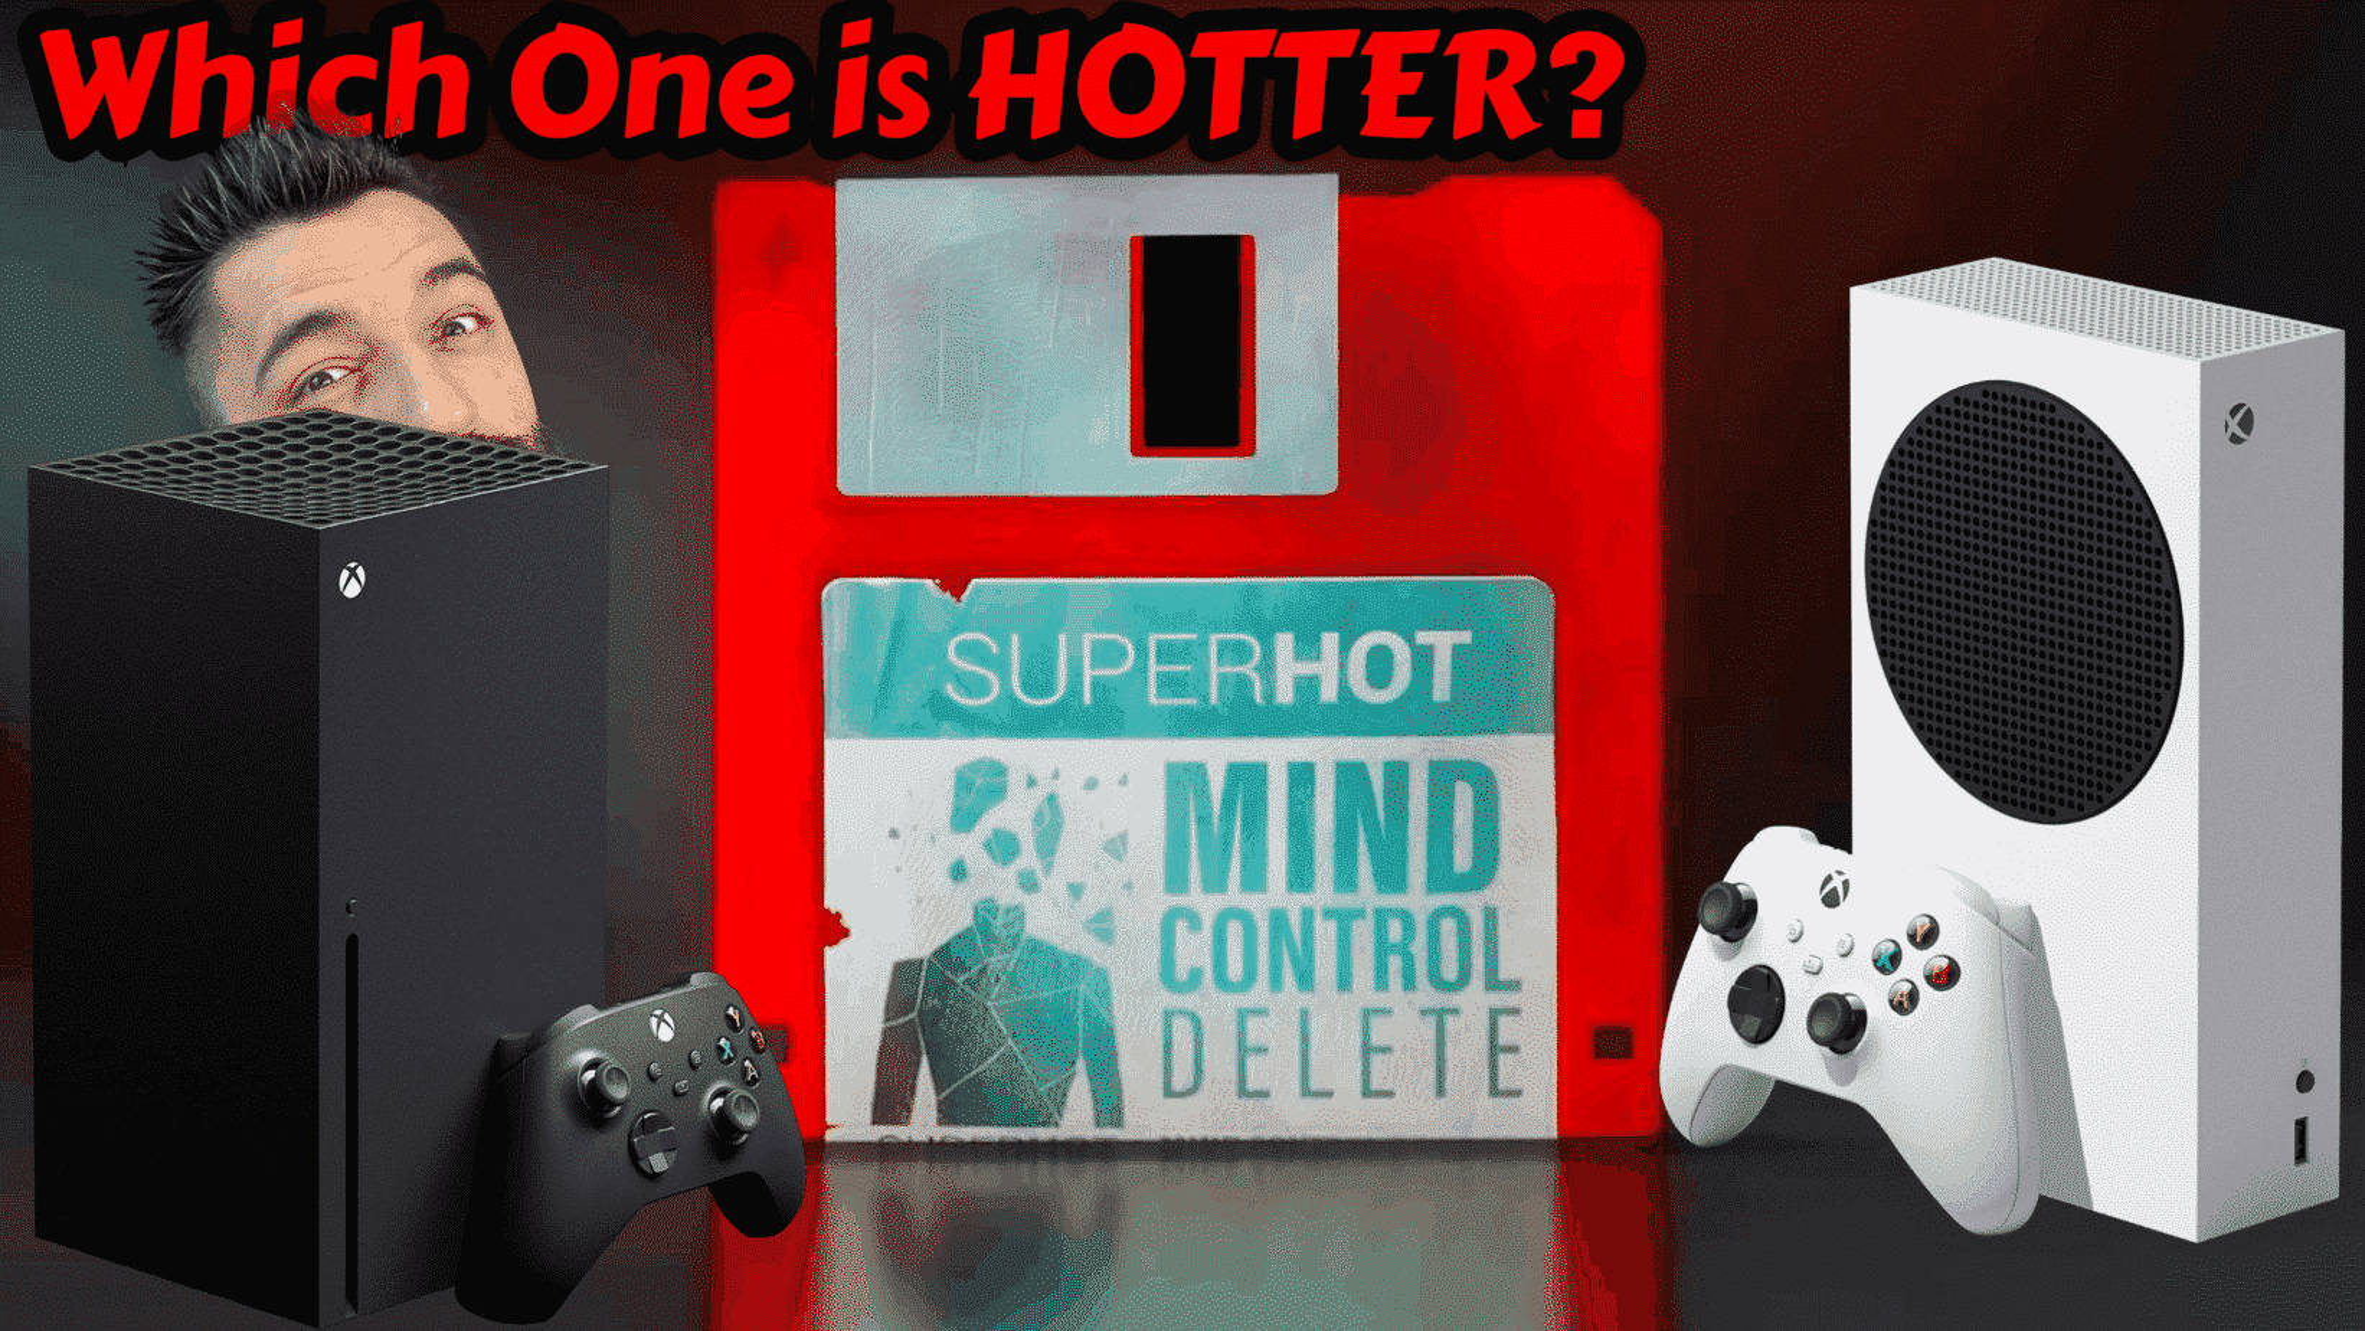 SuperHot Mind Control Delete Xbox Series X and Xbox Series S are Boring!